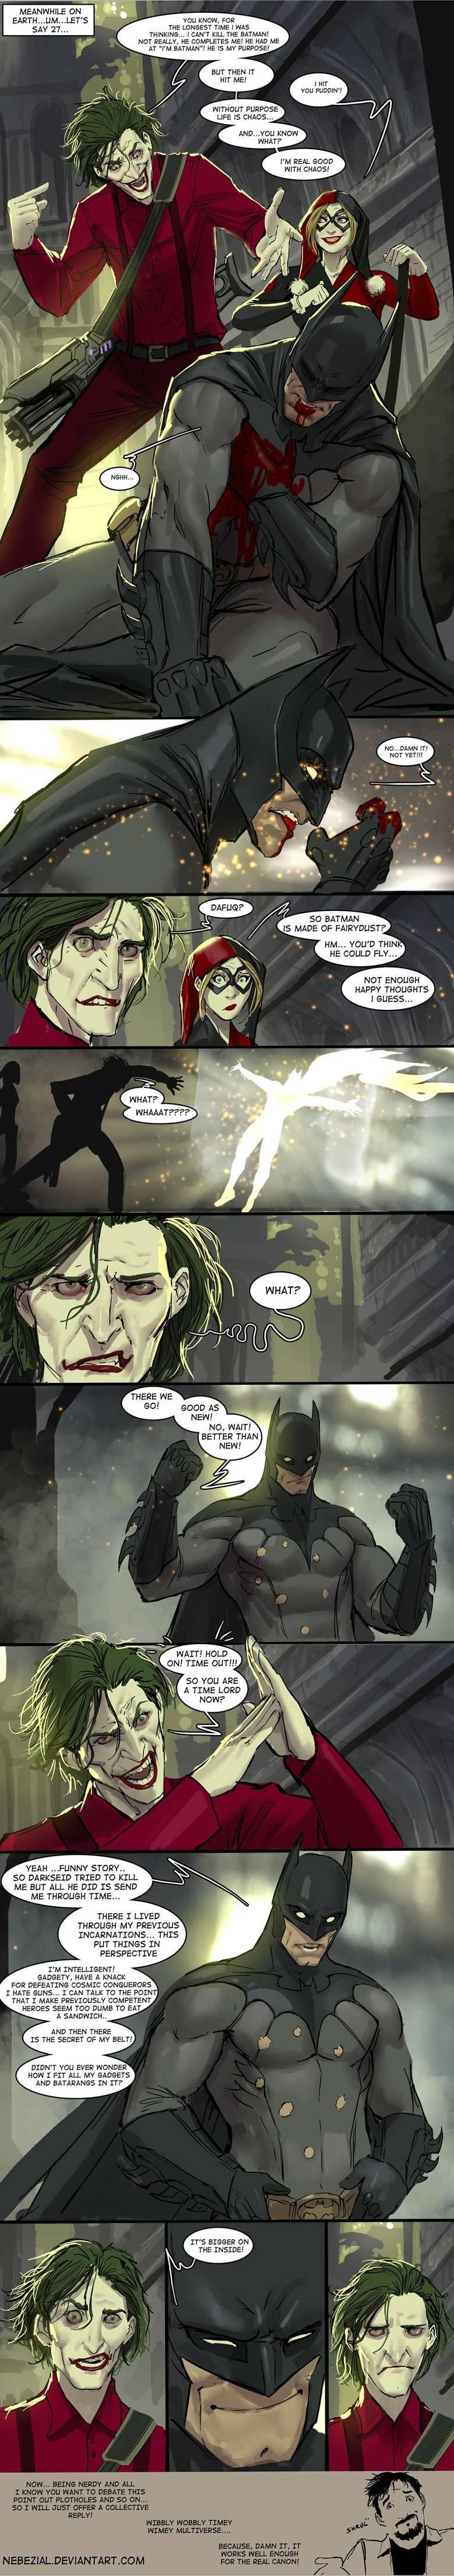 The Truth About Batman. Deds to nebezial on deviantart www.deviantart.com/art/it-s-simple-we-kill-the-doctor-no-wait-batman-420747605. mu KNOW, FOR THE LONGEST  batman Doctor Who